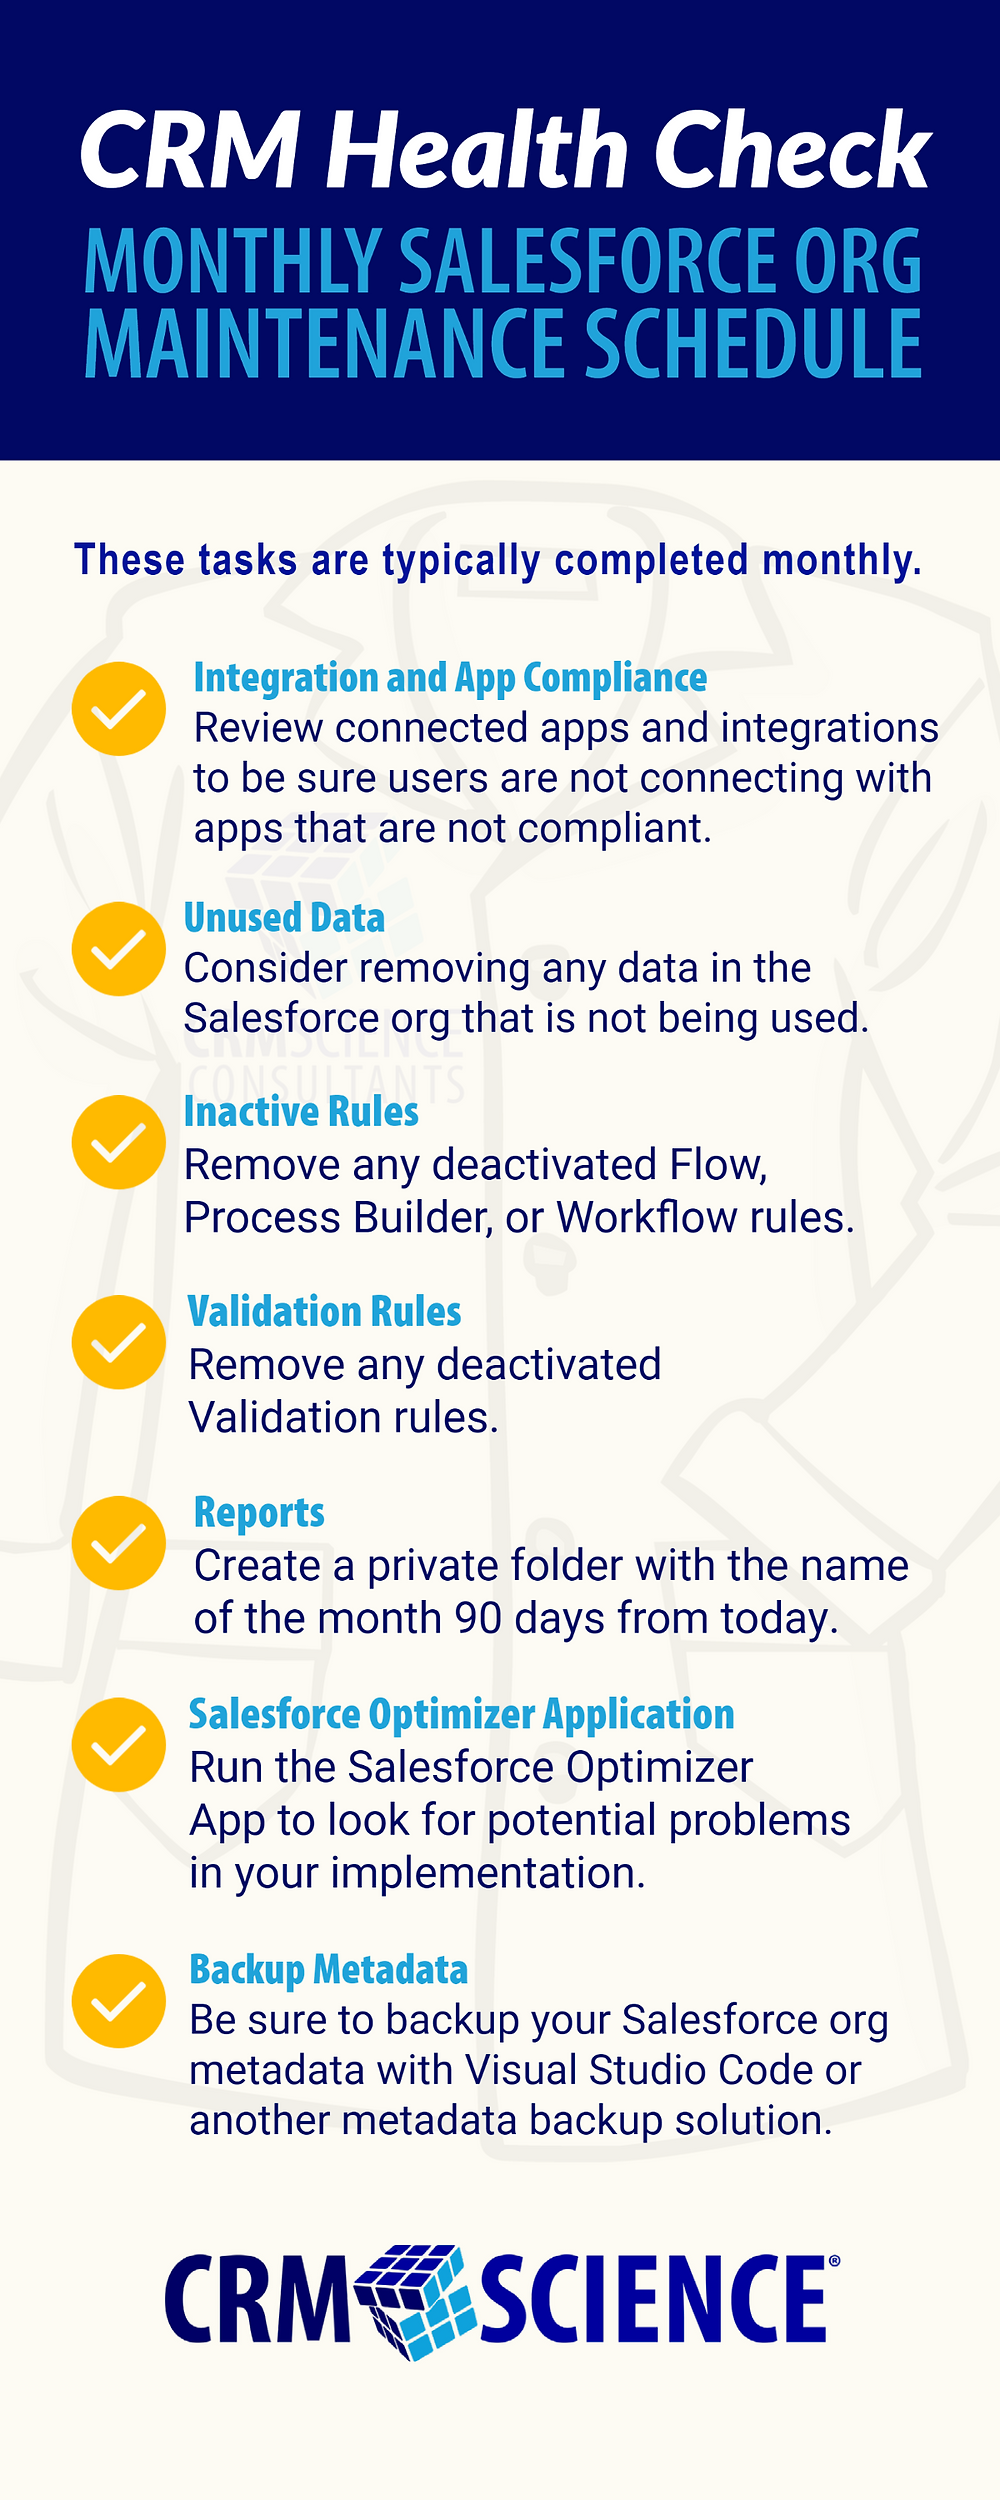 CRM Health Check: Monthly Salesforce Org Maintenance Schedule